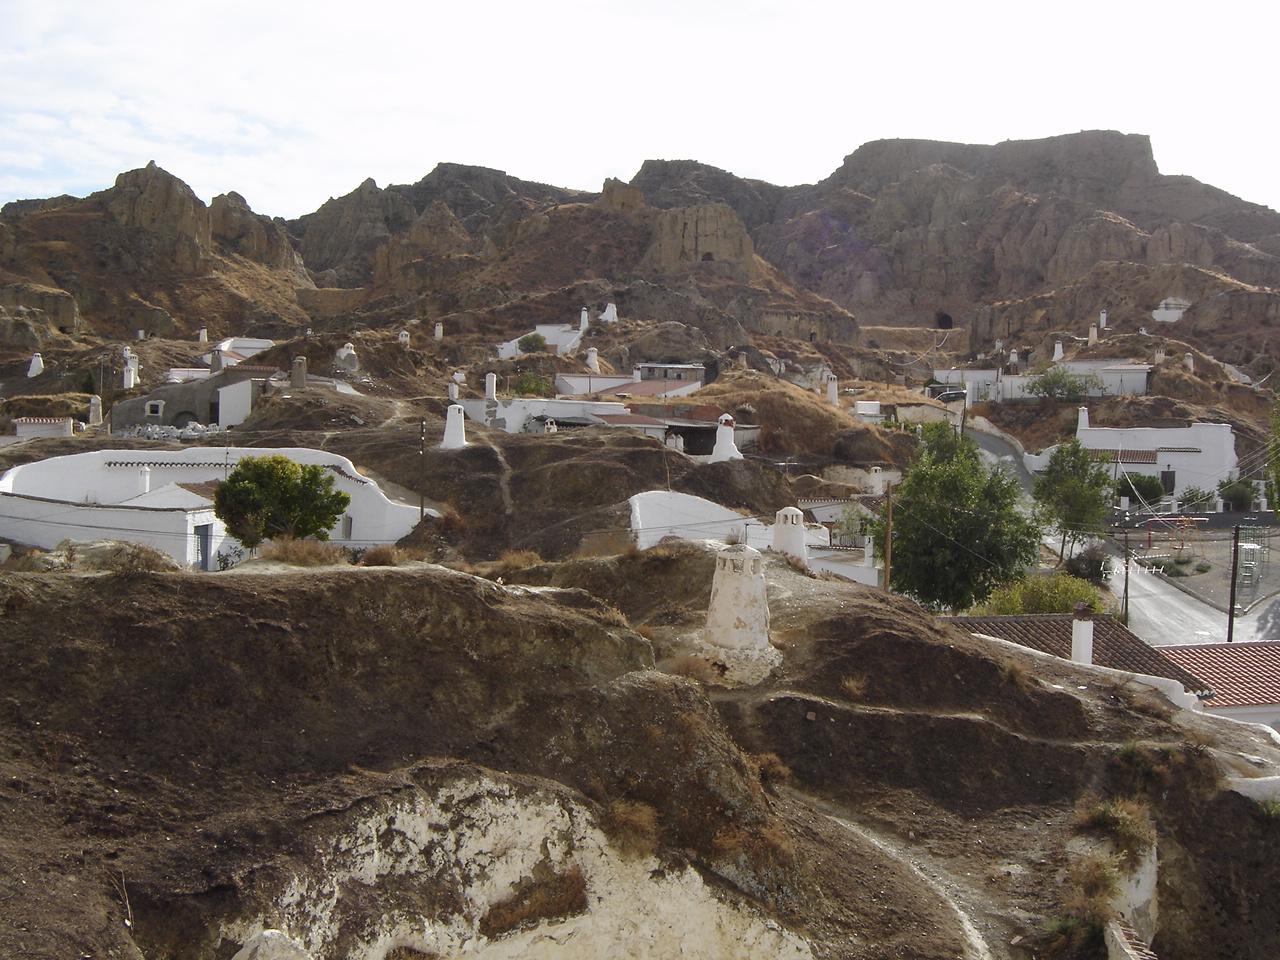 casas-cuevas-como-viviendas-turisticas (2)